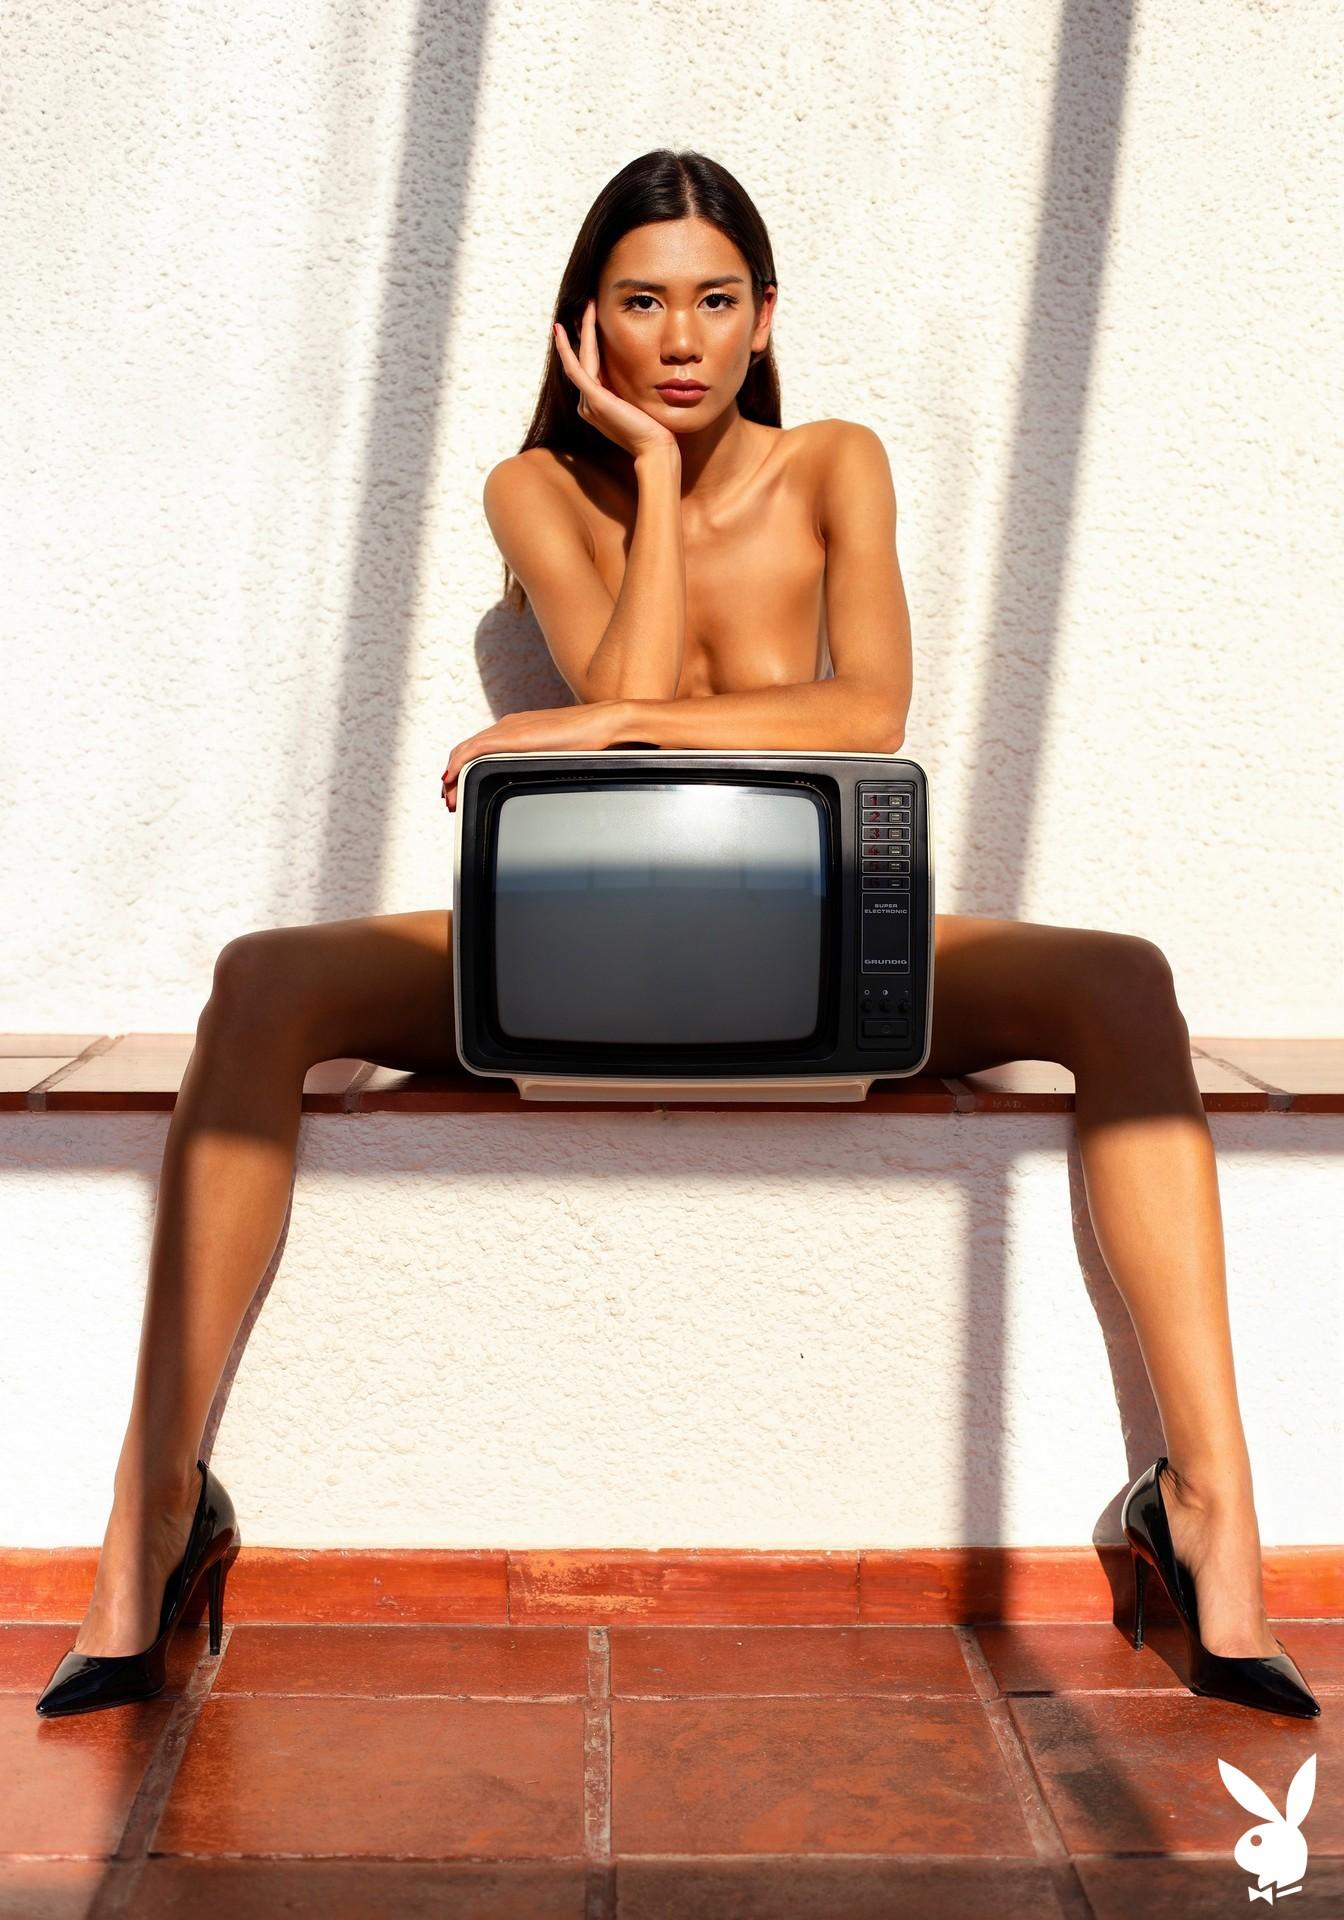 Cledia Fortin For Playboy International Playboy Plus (4)